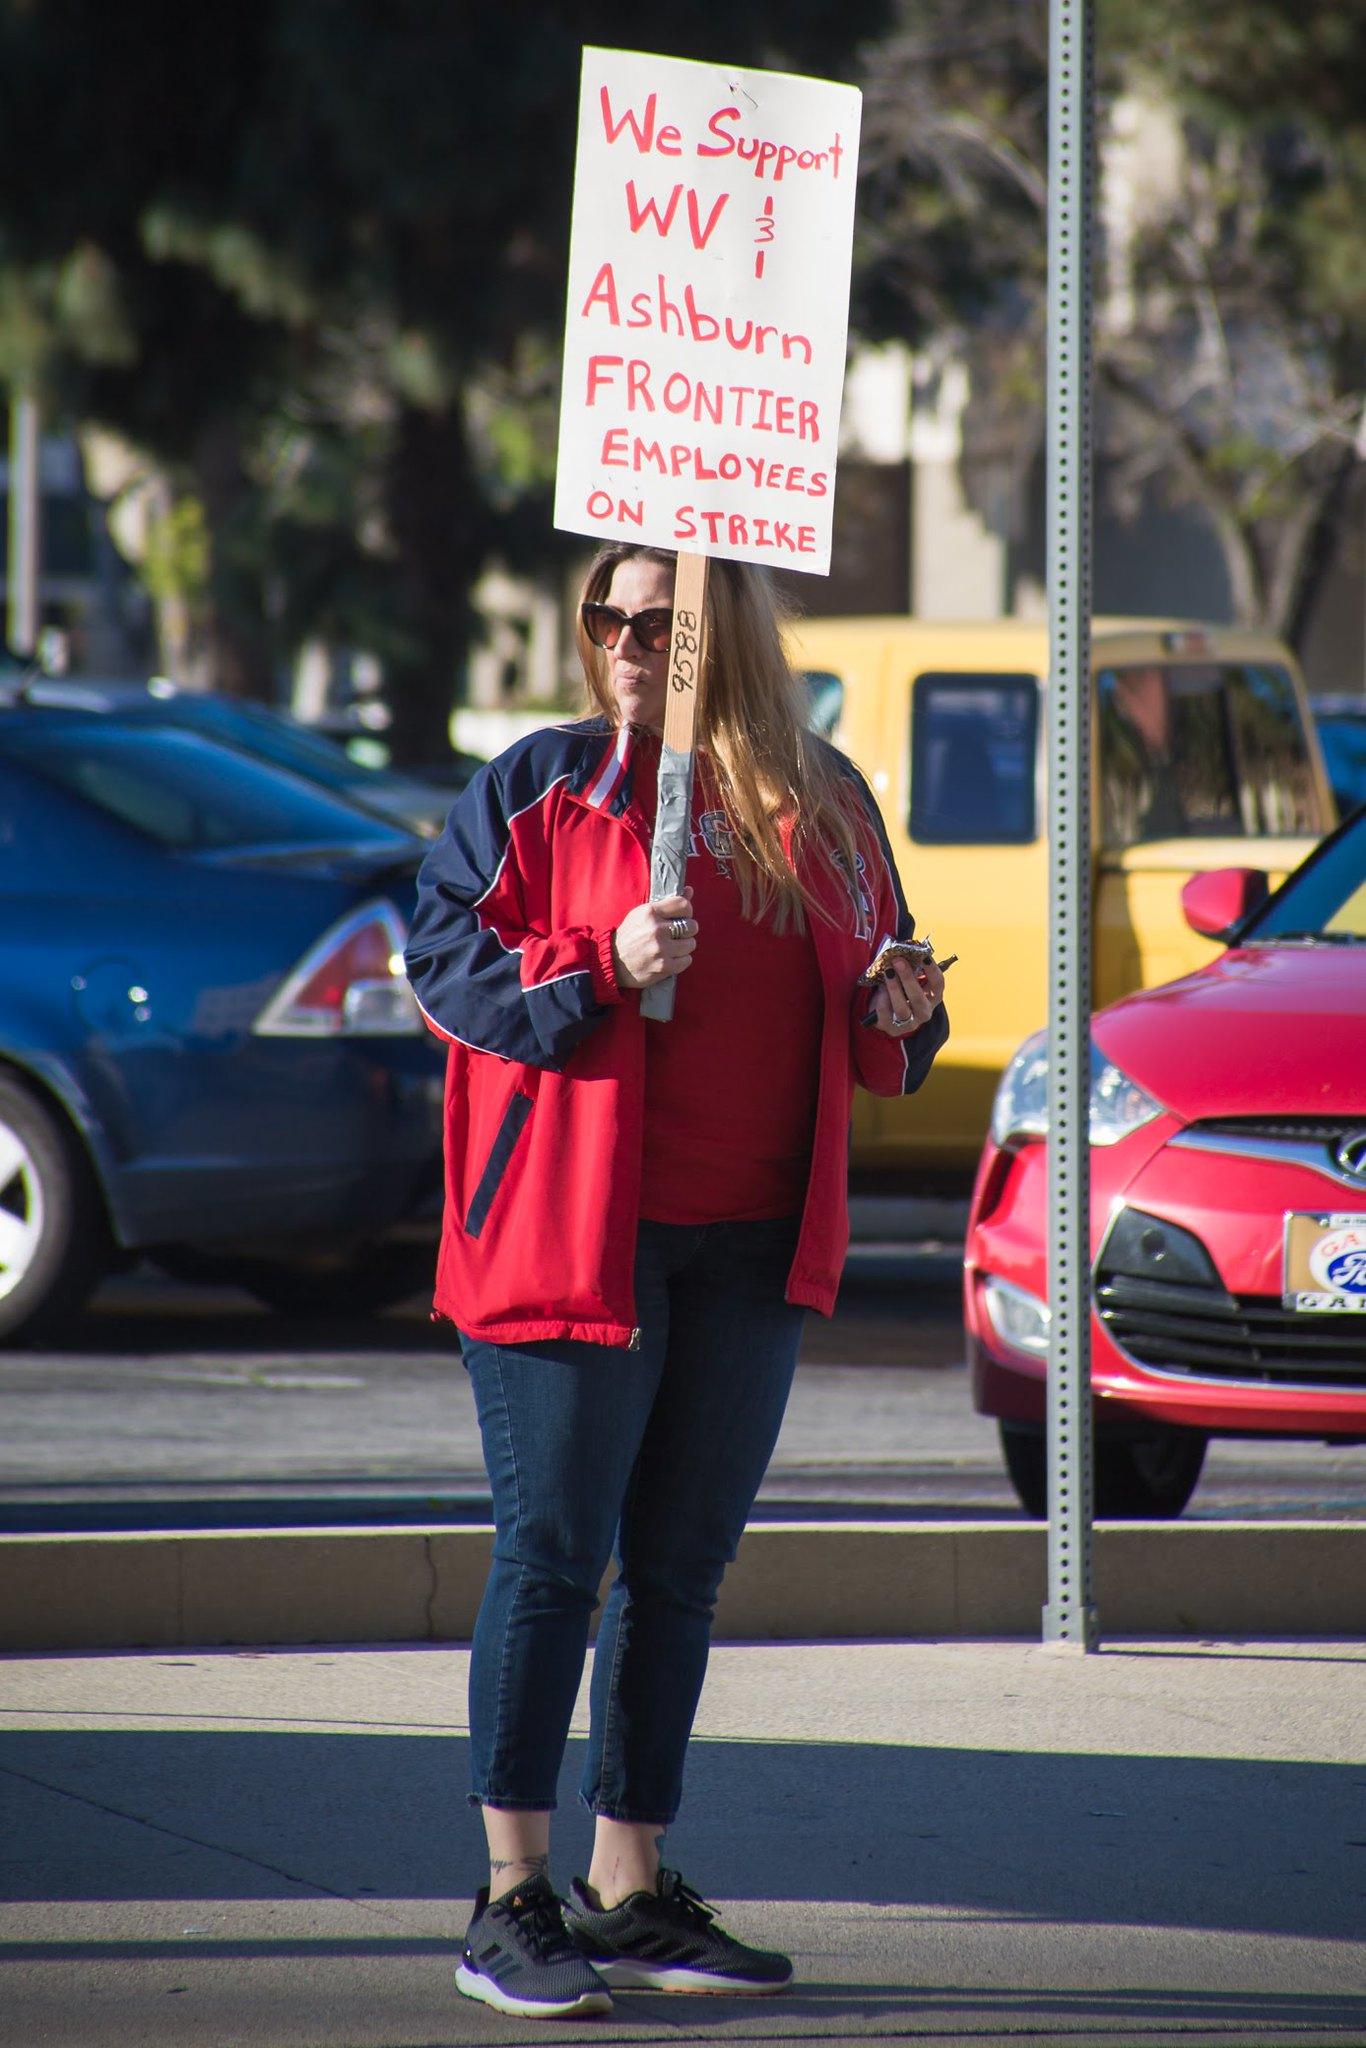 Frontier Strike Solidarity Action in California